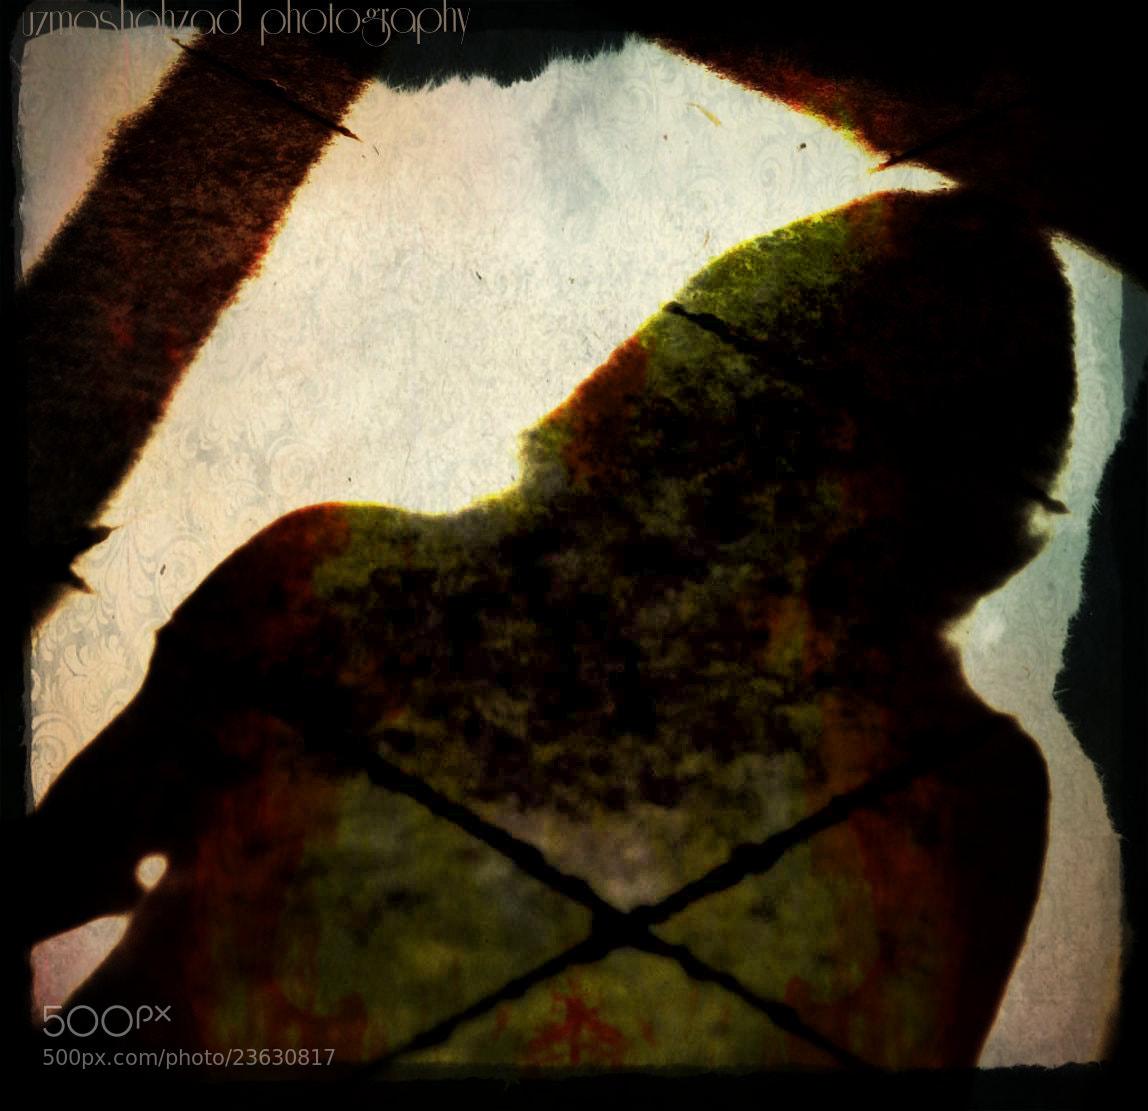 Photograph dark shadow by uzma shahzad on 500px